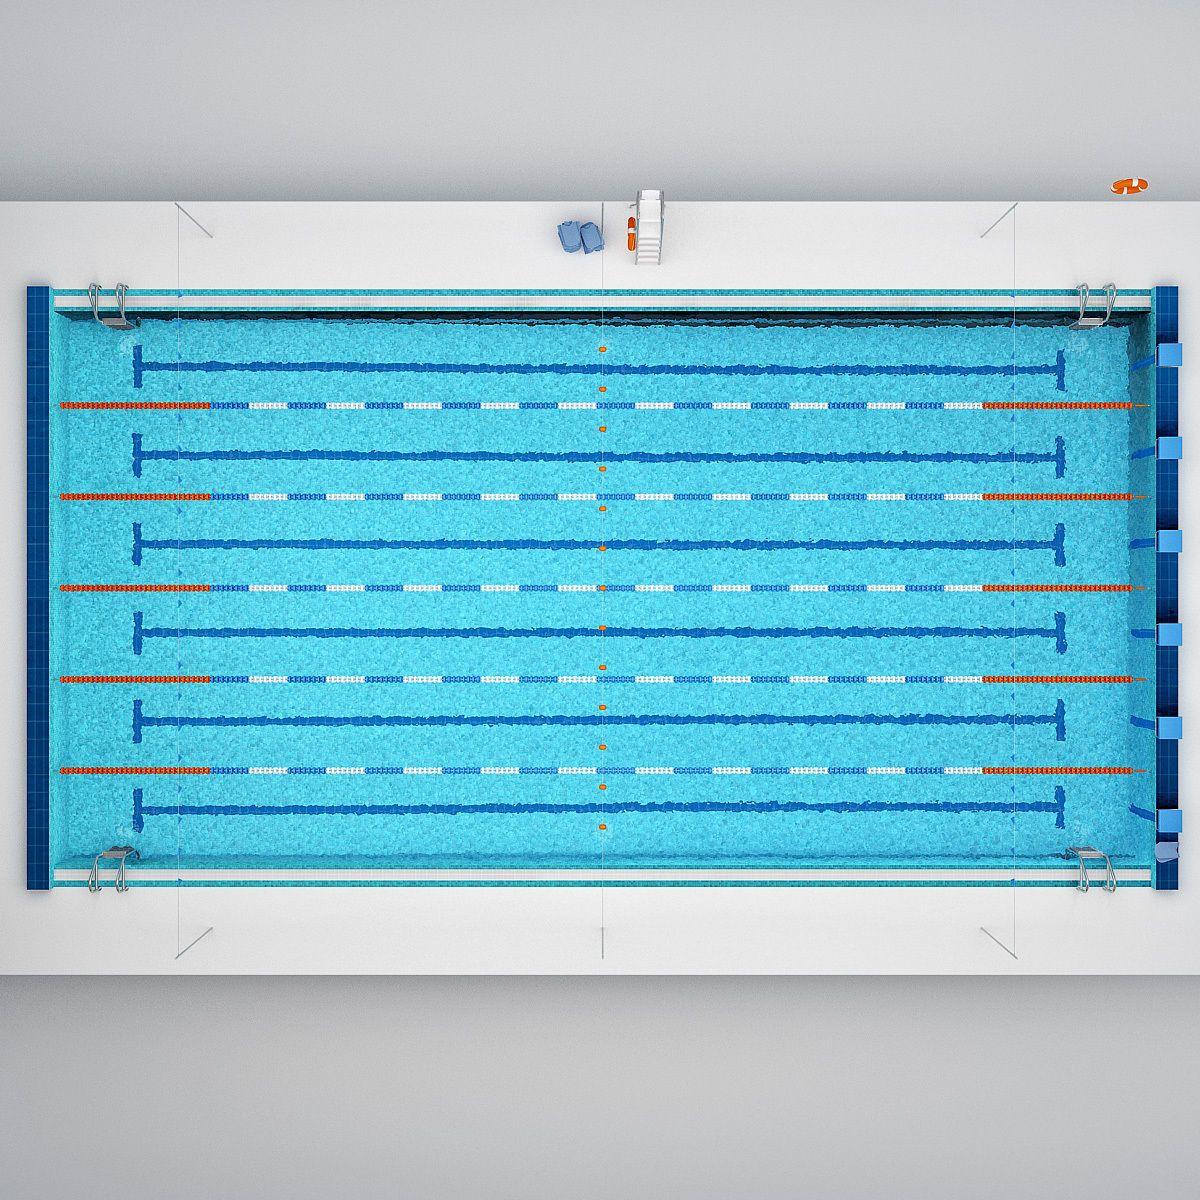 Swimming Pool 3d Model Swimming Pools Swimming Pool Ladders Swimming Pool Dimensions